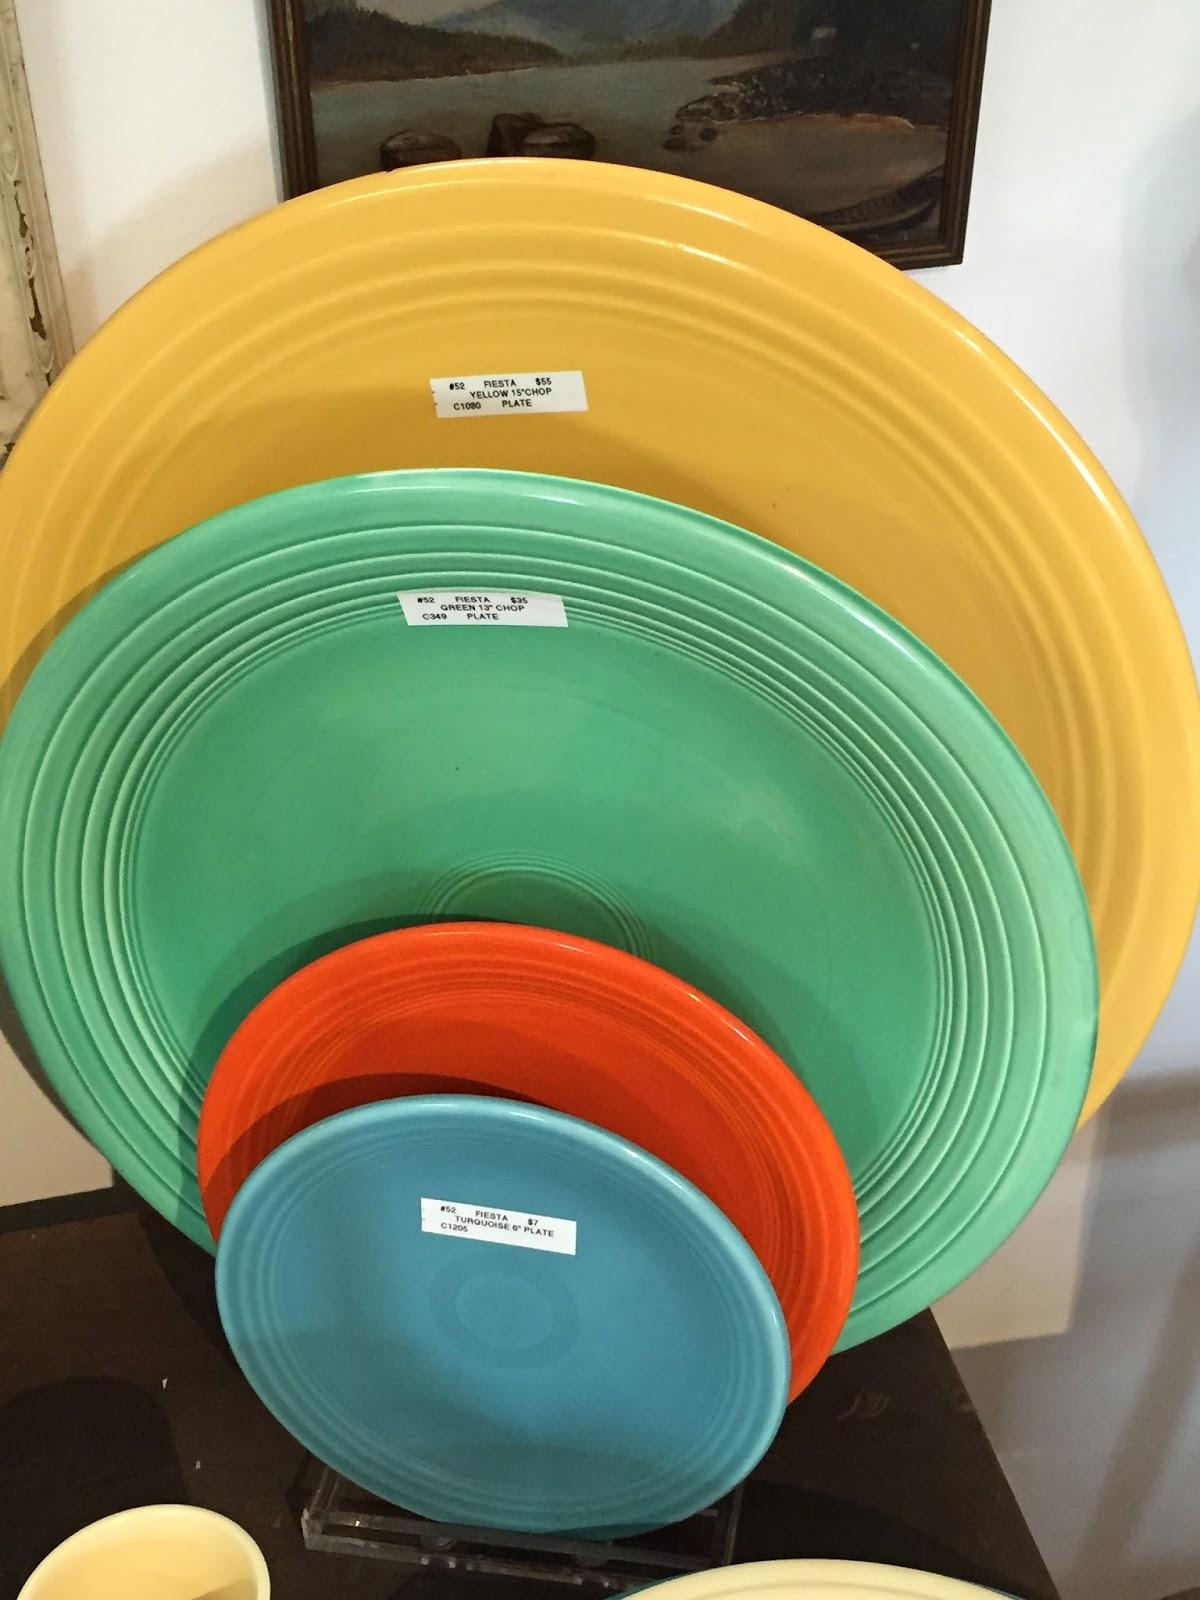 Collecting Vintage Fiesta Dinnerware and Homer Laughlin Pottery & C. Dianne Zweig - Kitsch u0027n Stuff: Announcing Vintage Fiesta ...